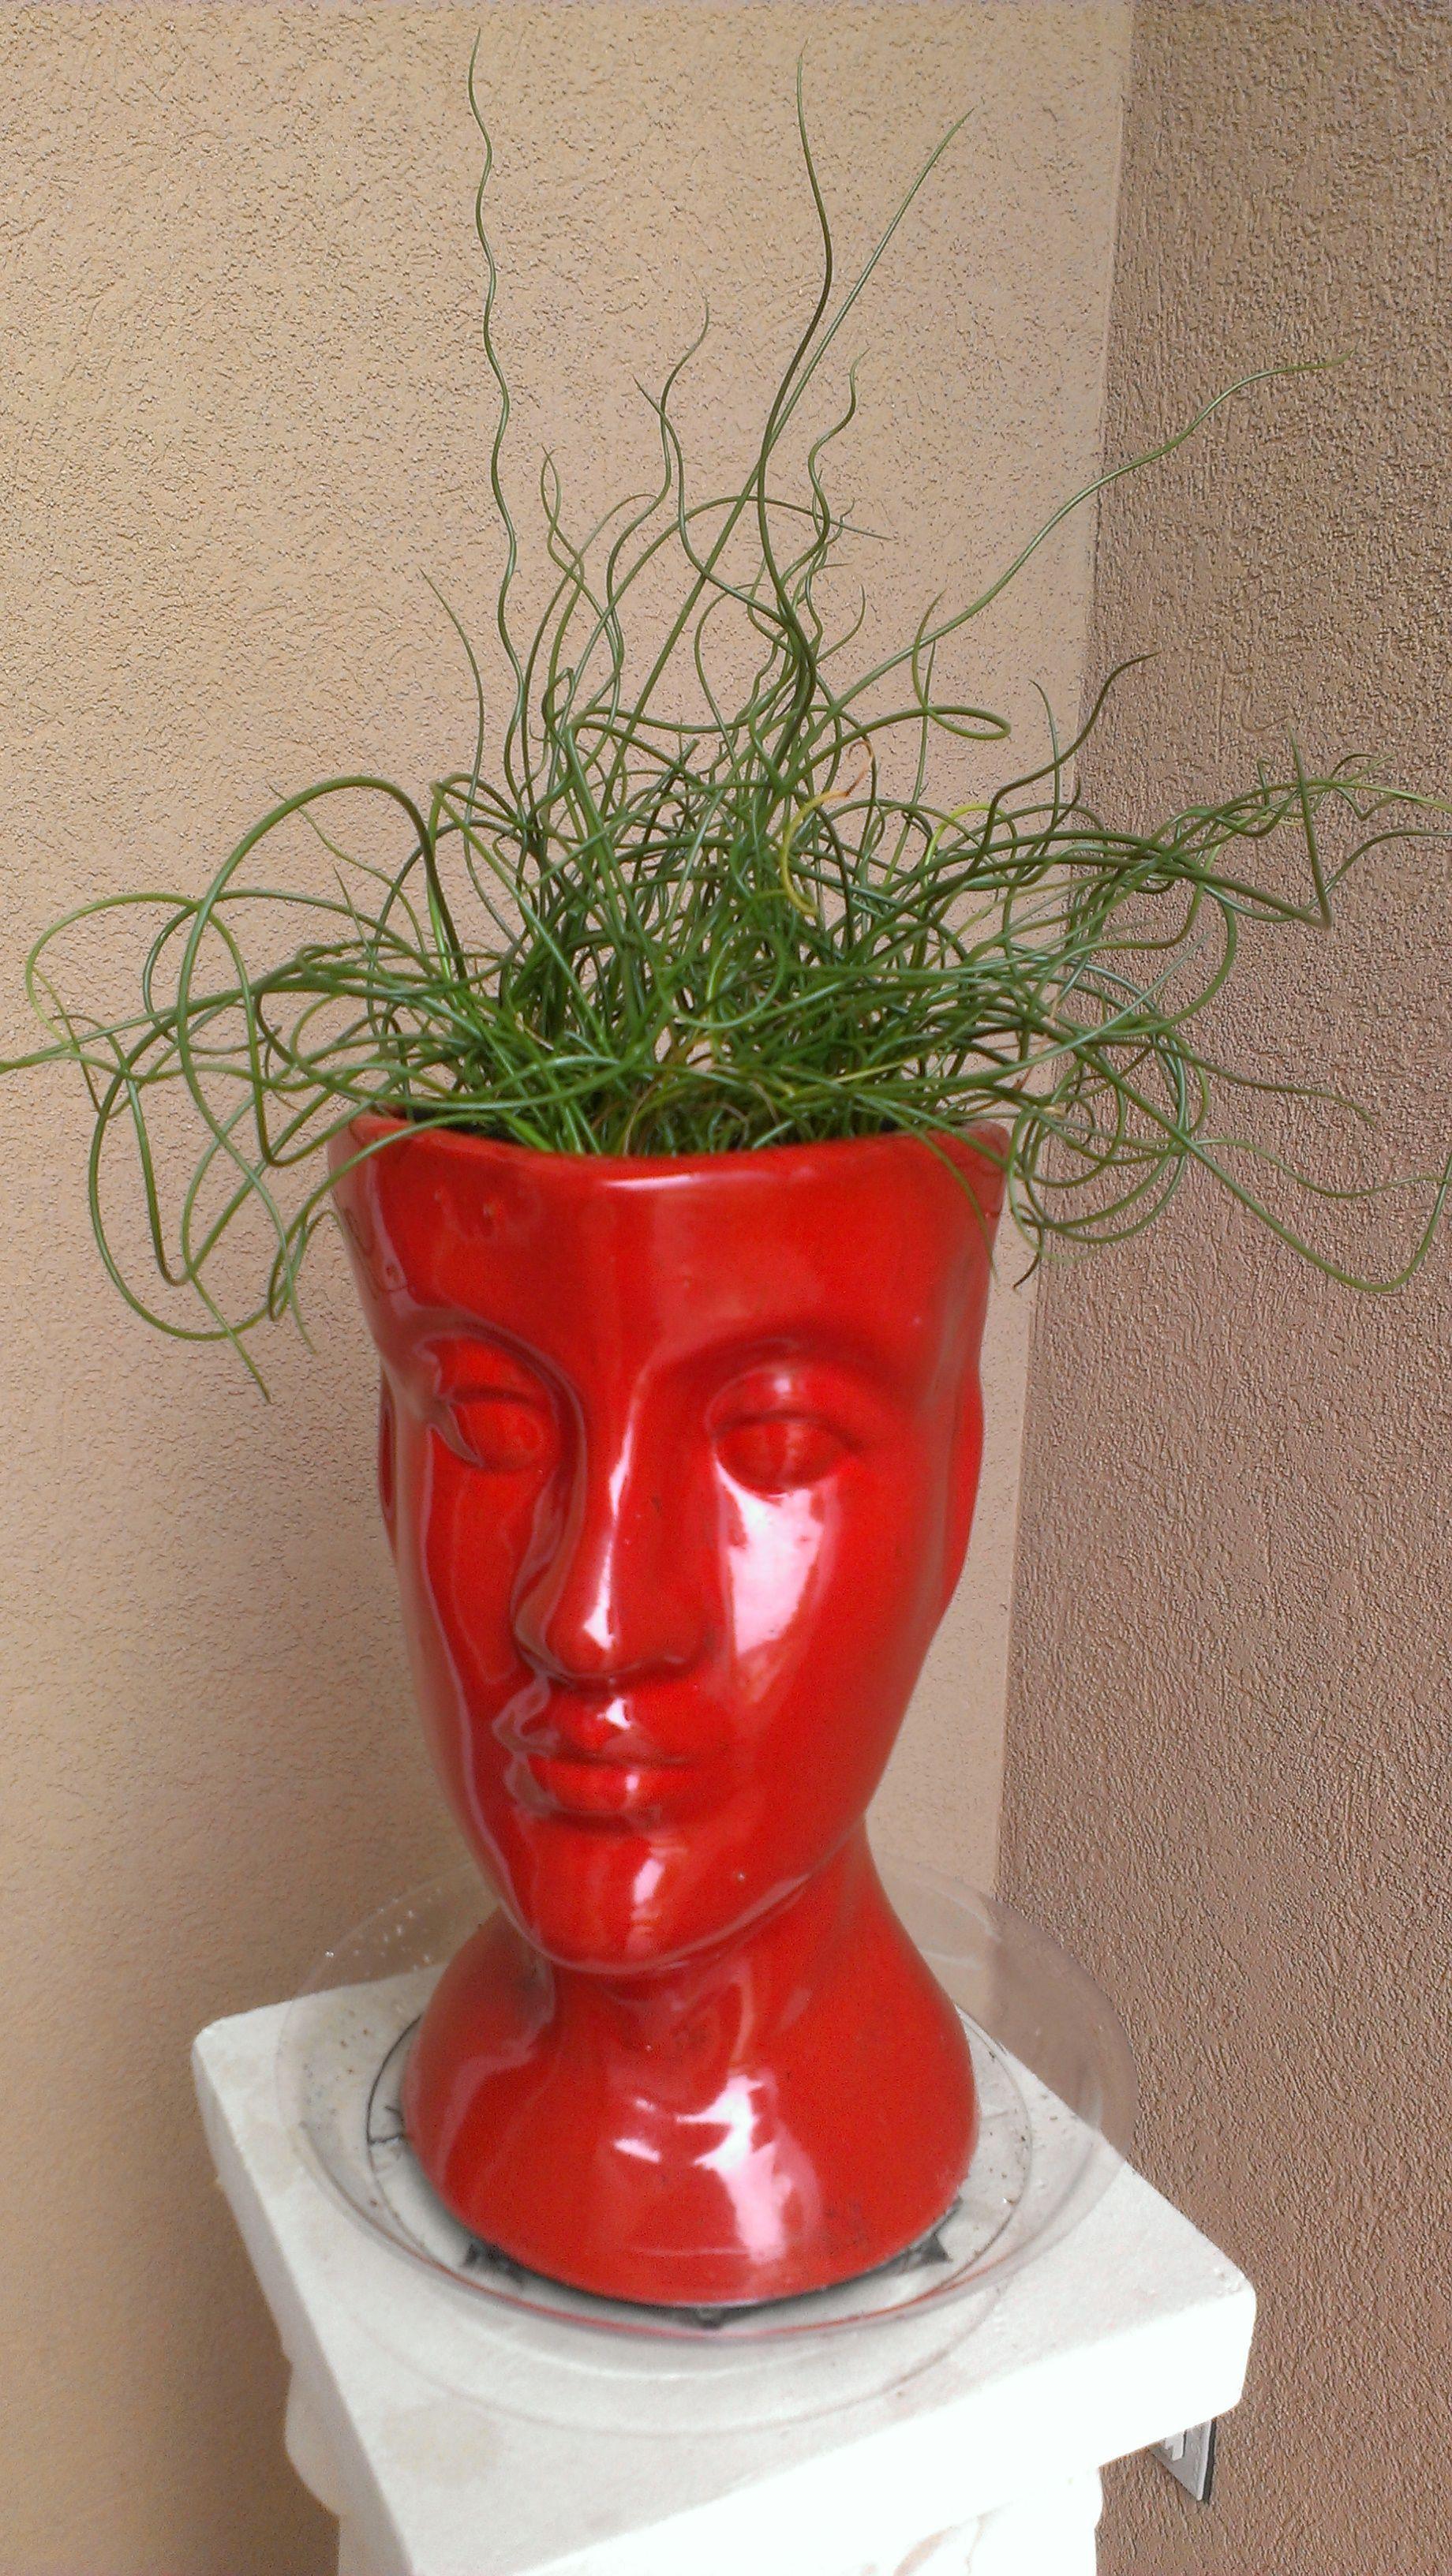 mannequin head vase of 24 large plant vase the weekly world intended for 24 large plant vase